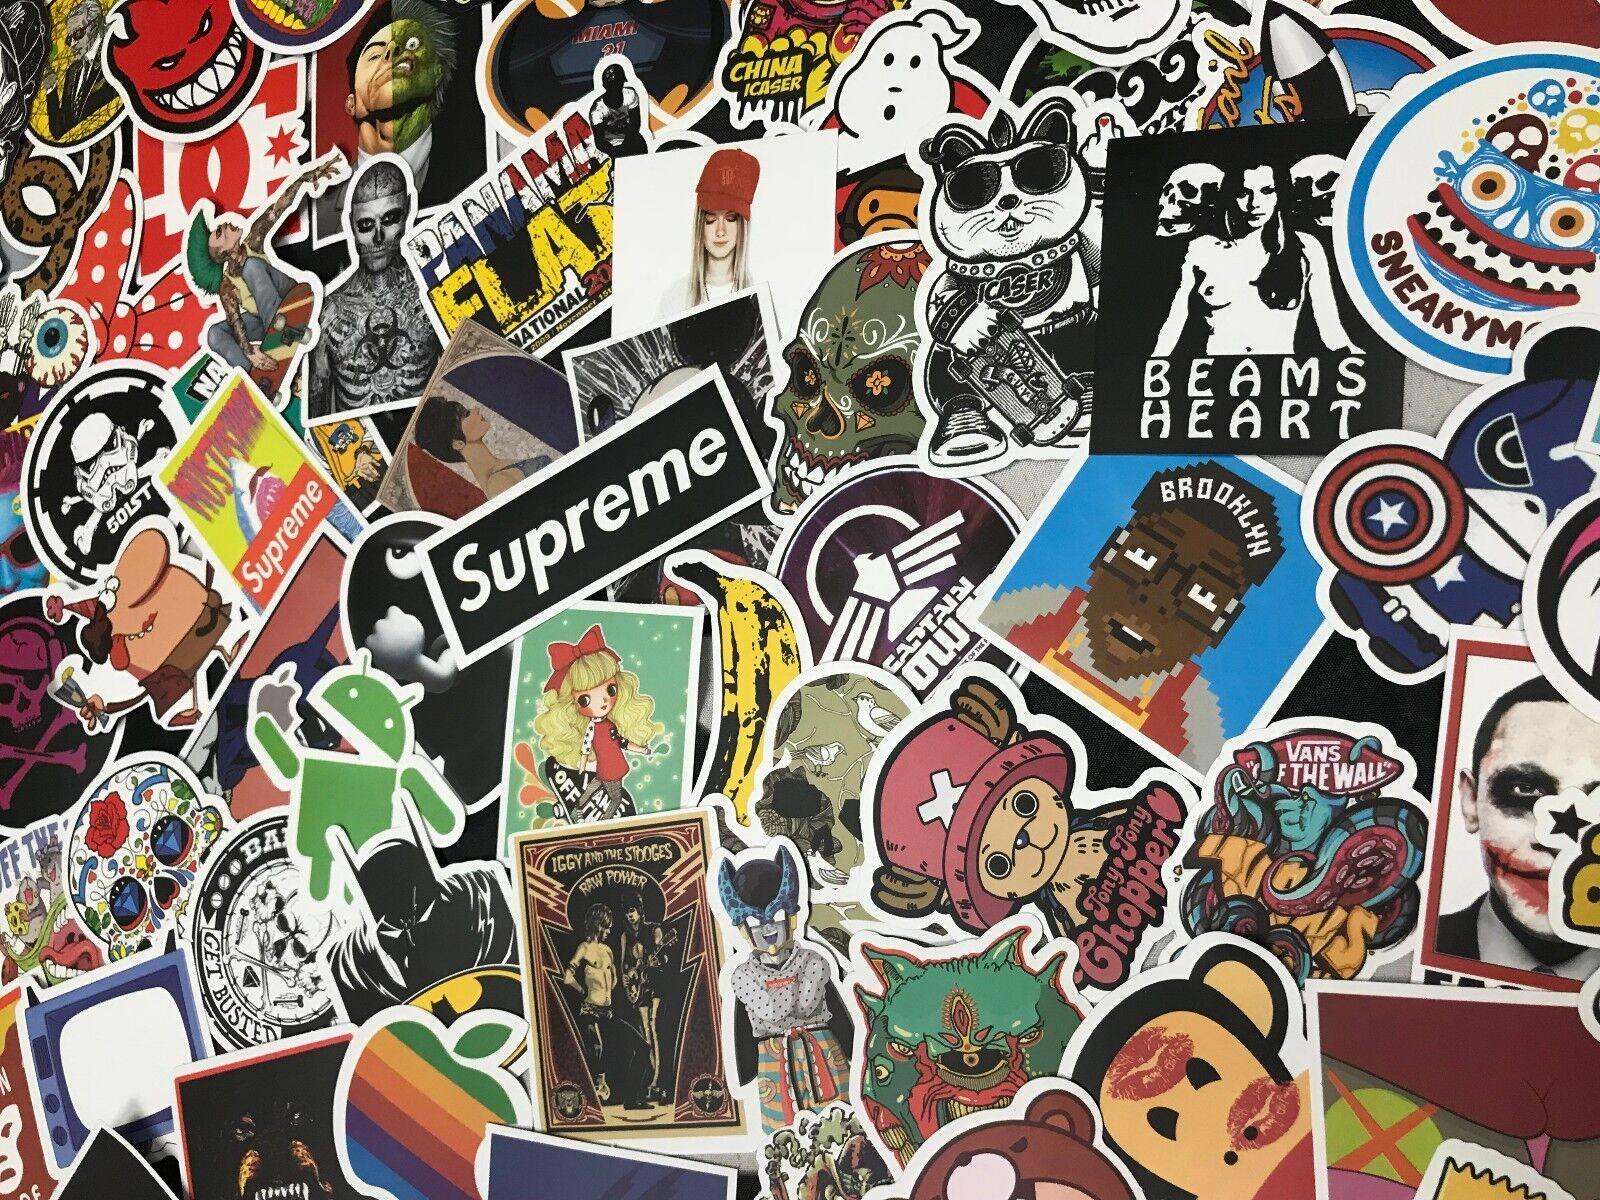 100pcs cool skateboard stickers bulk pack snowboard vinyl decor decals black for sale online ebay